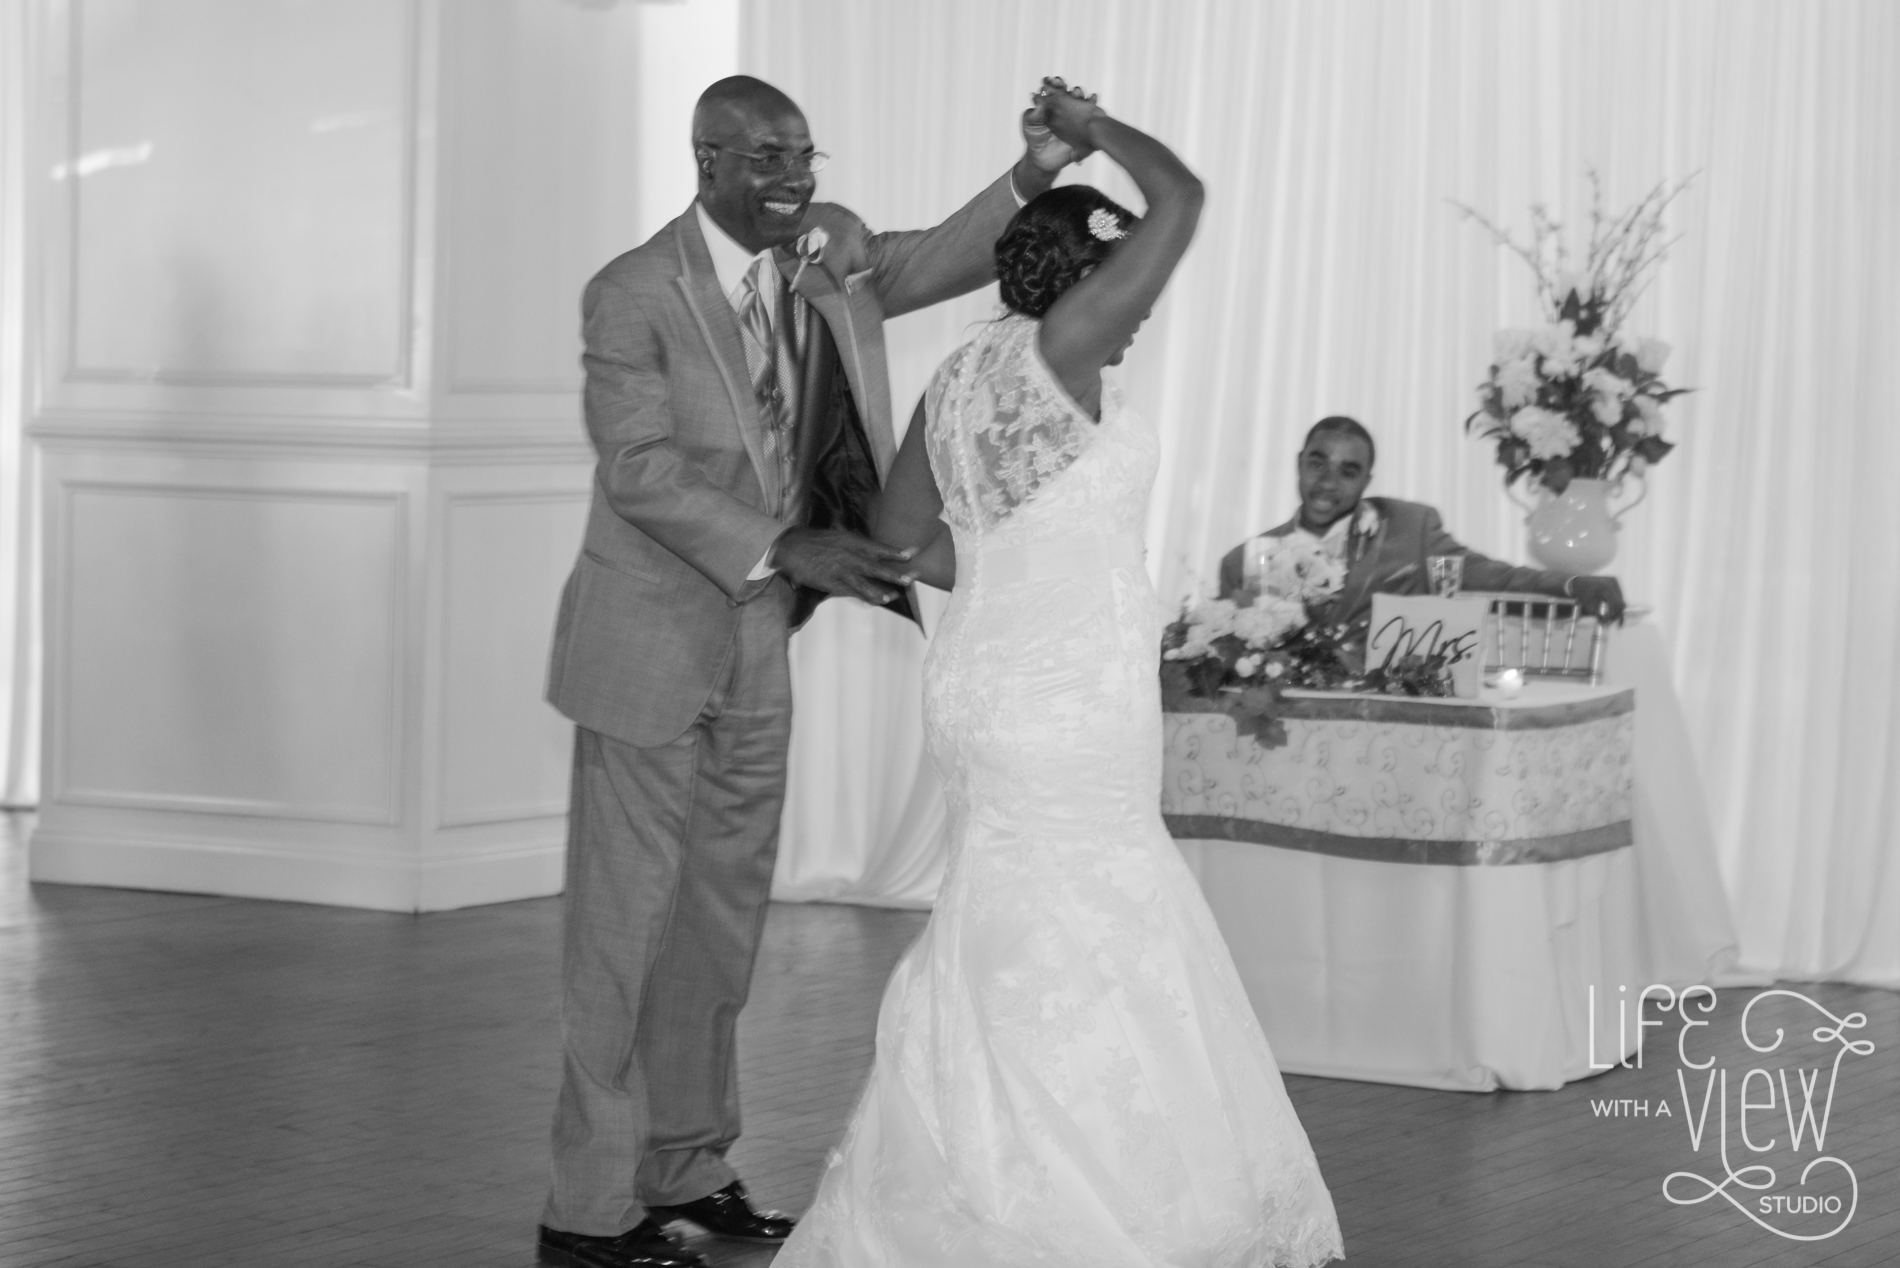 Stratton-Hall-Wedding-45.jpg